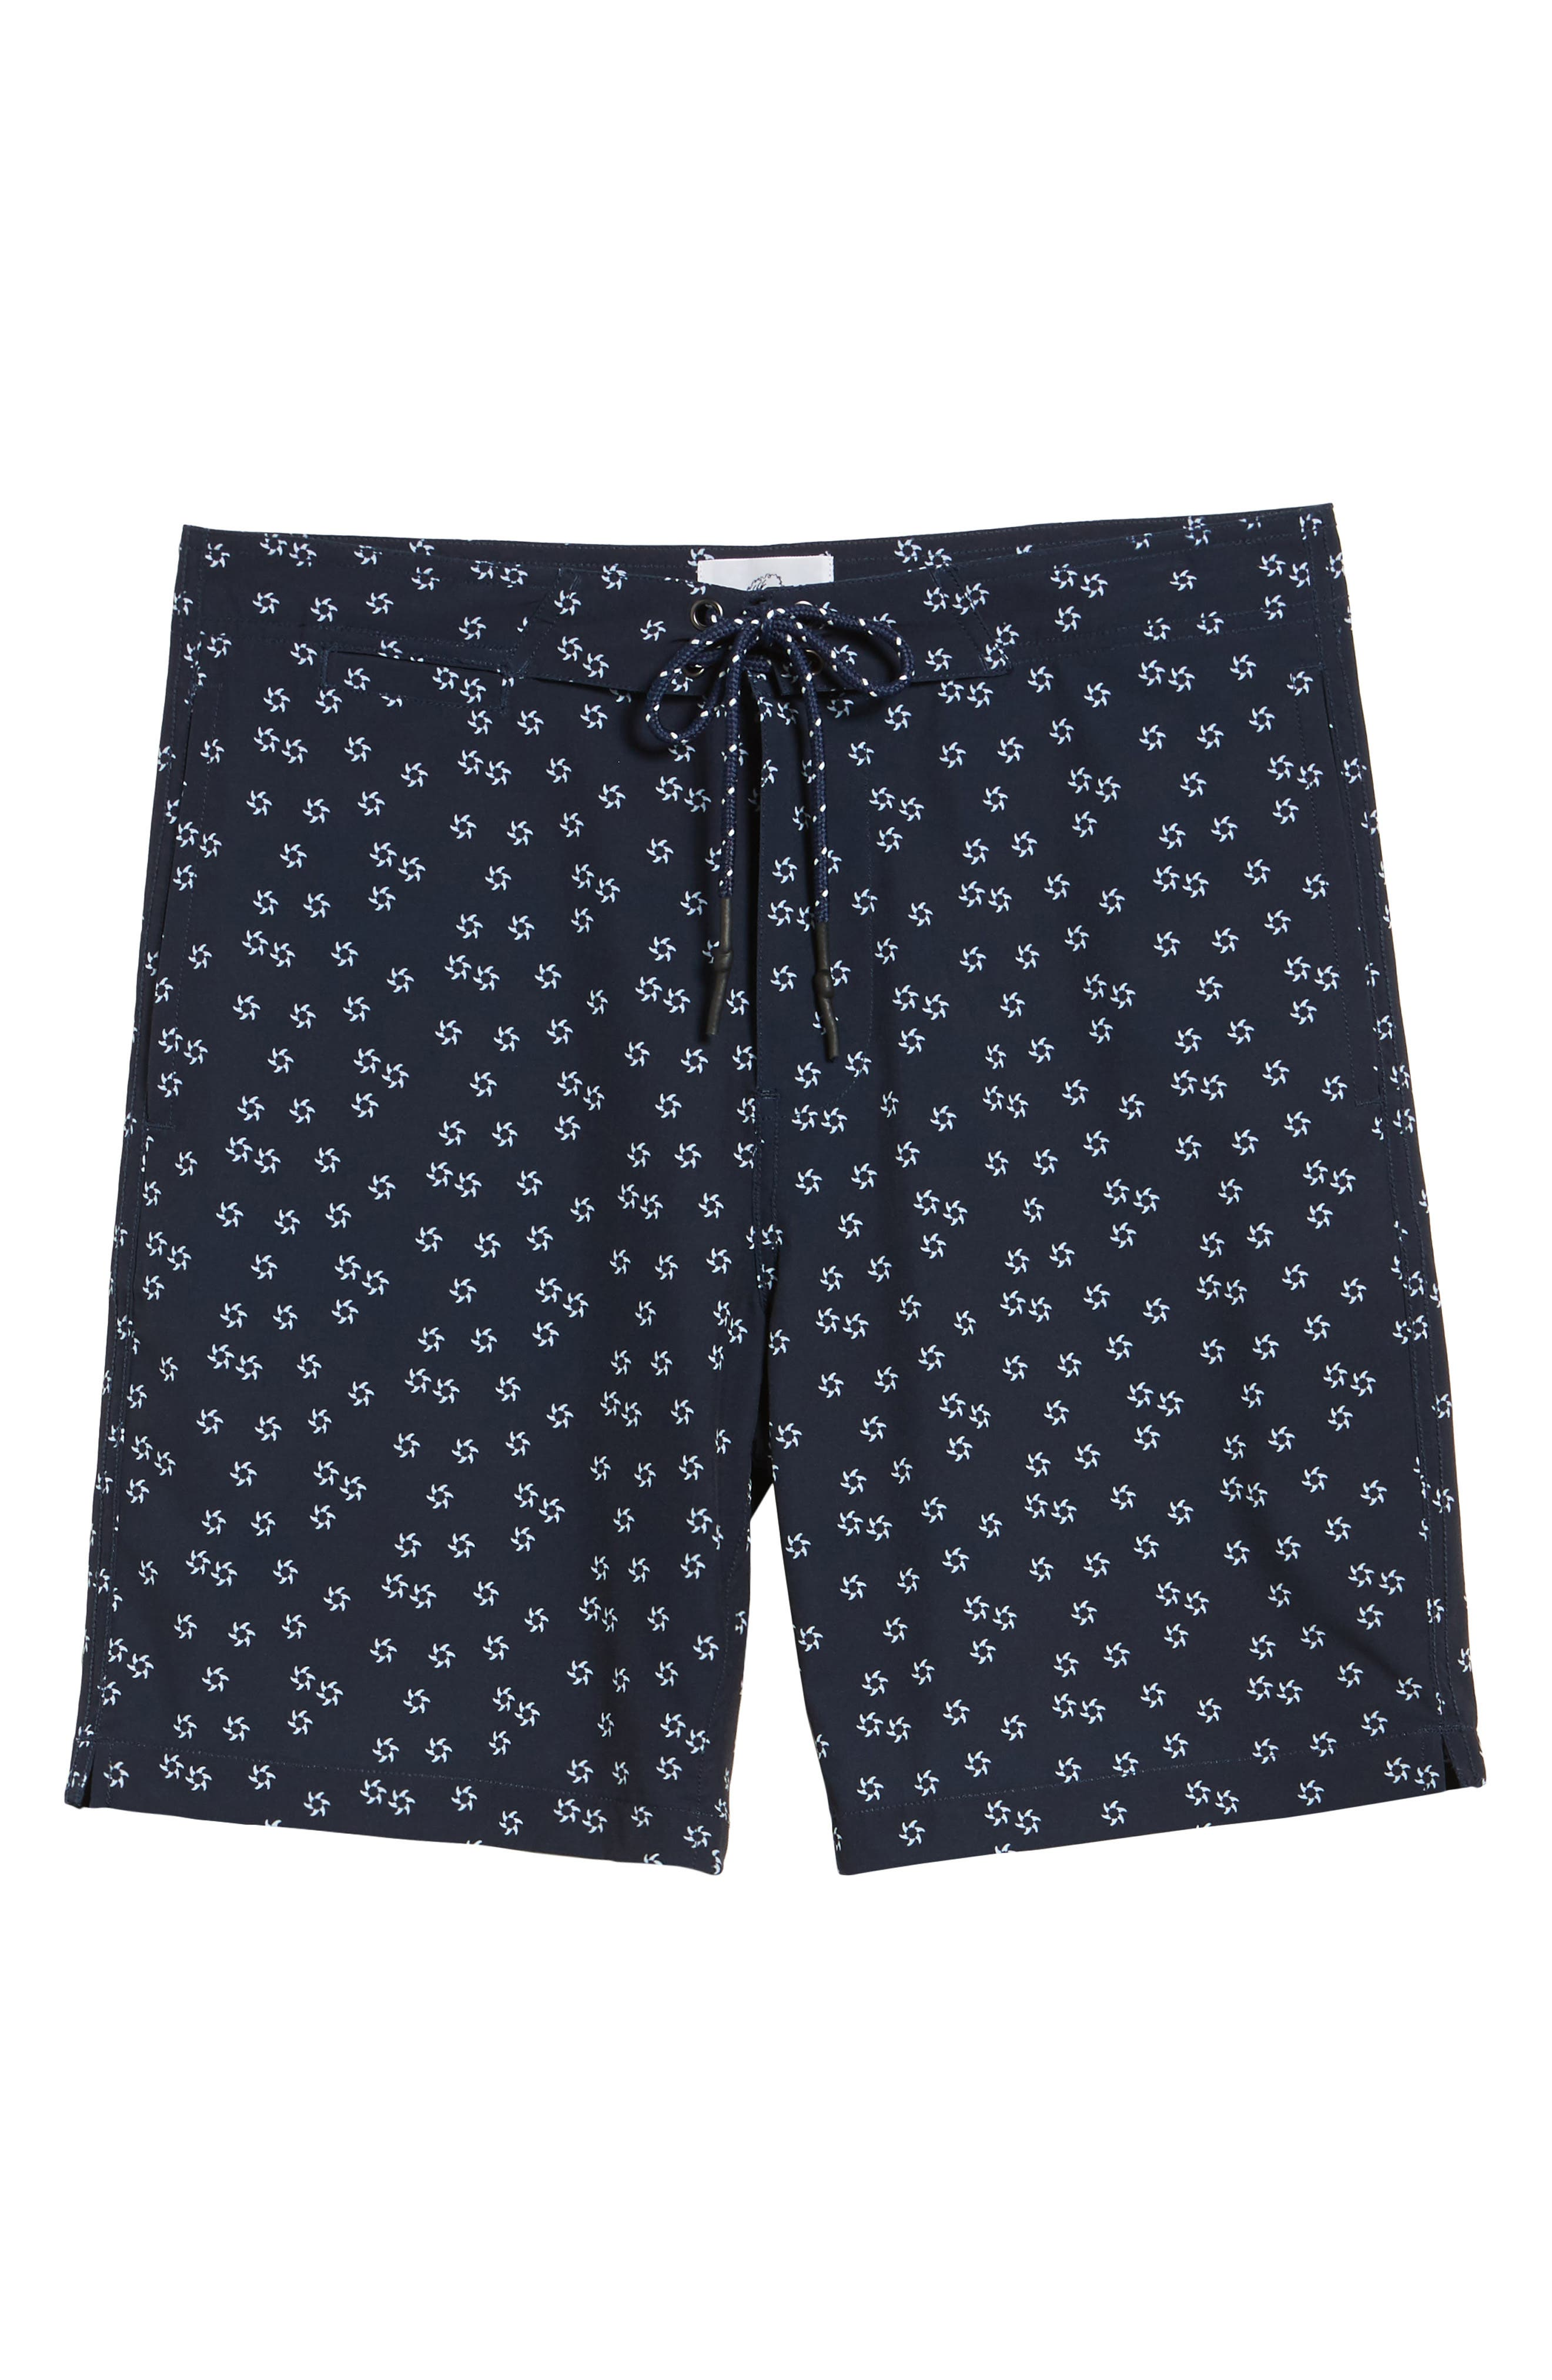 Fin Print Board Shorts,                             Alternate thumbnail 6, color,                             Navy Blazer